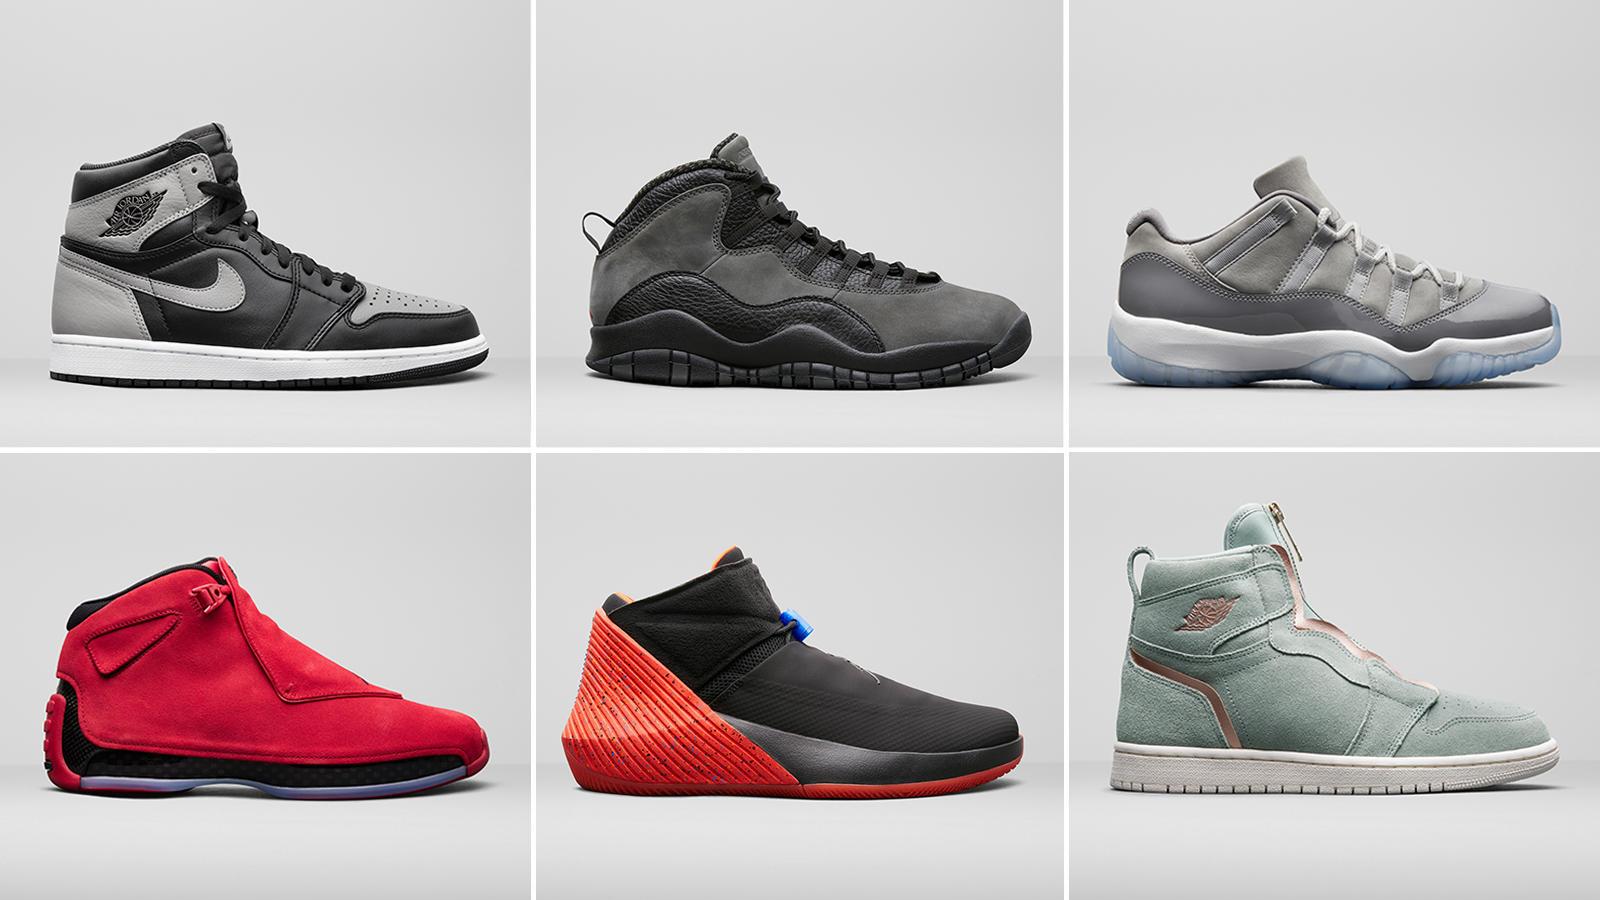 quality design 631df b7d61 Jordan Brand   Kicks Off Court   Kicks On Court   Retro Lifestyle ...